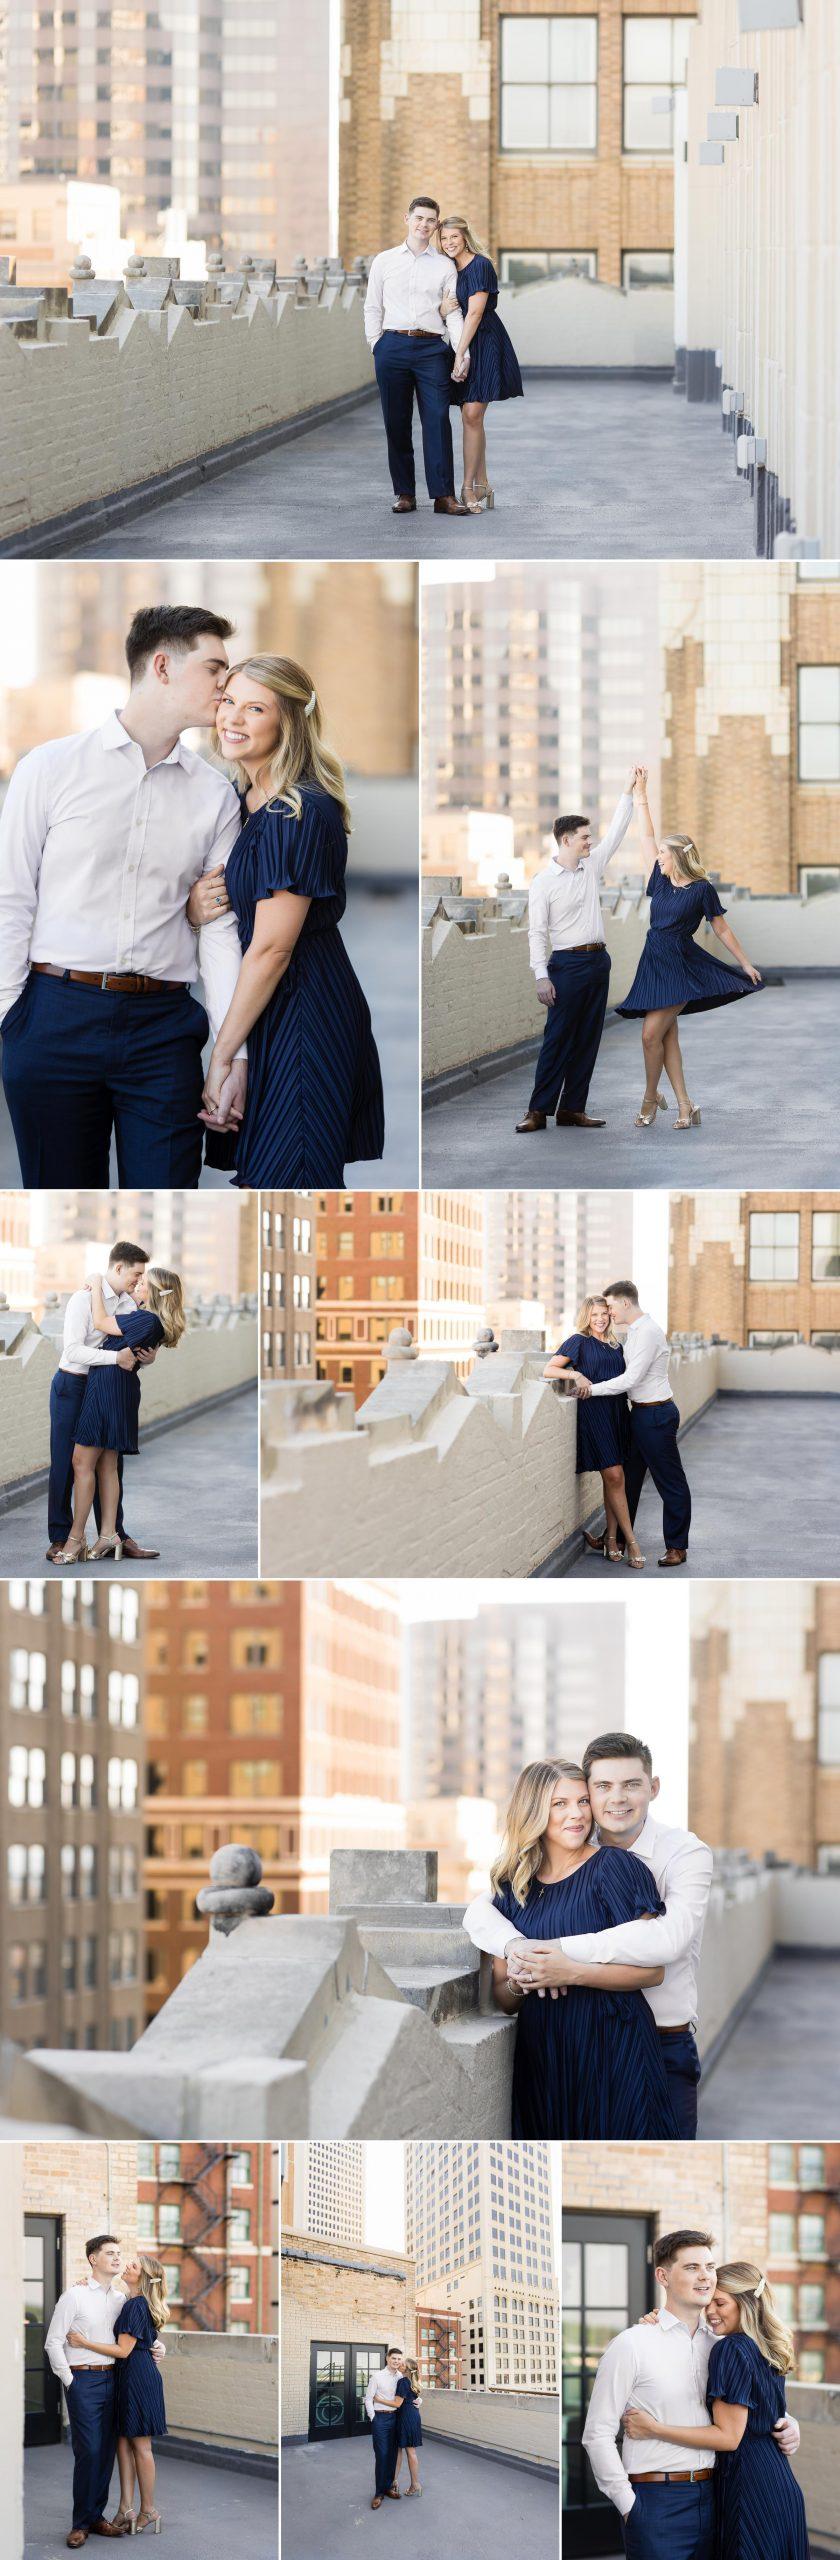 Tulsa Club Rooftop Engagement Session Wedding